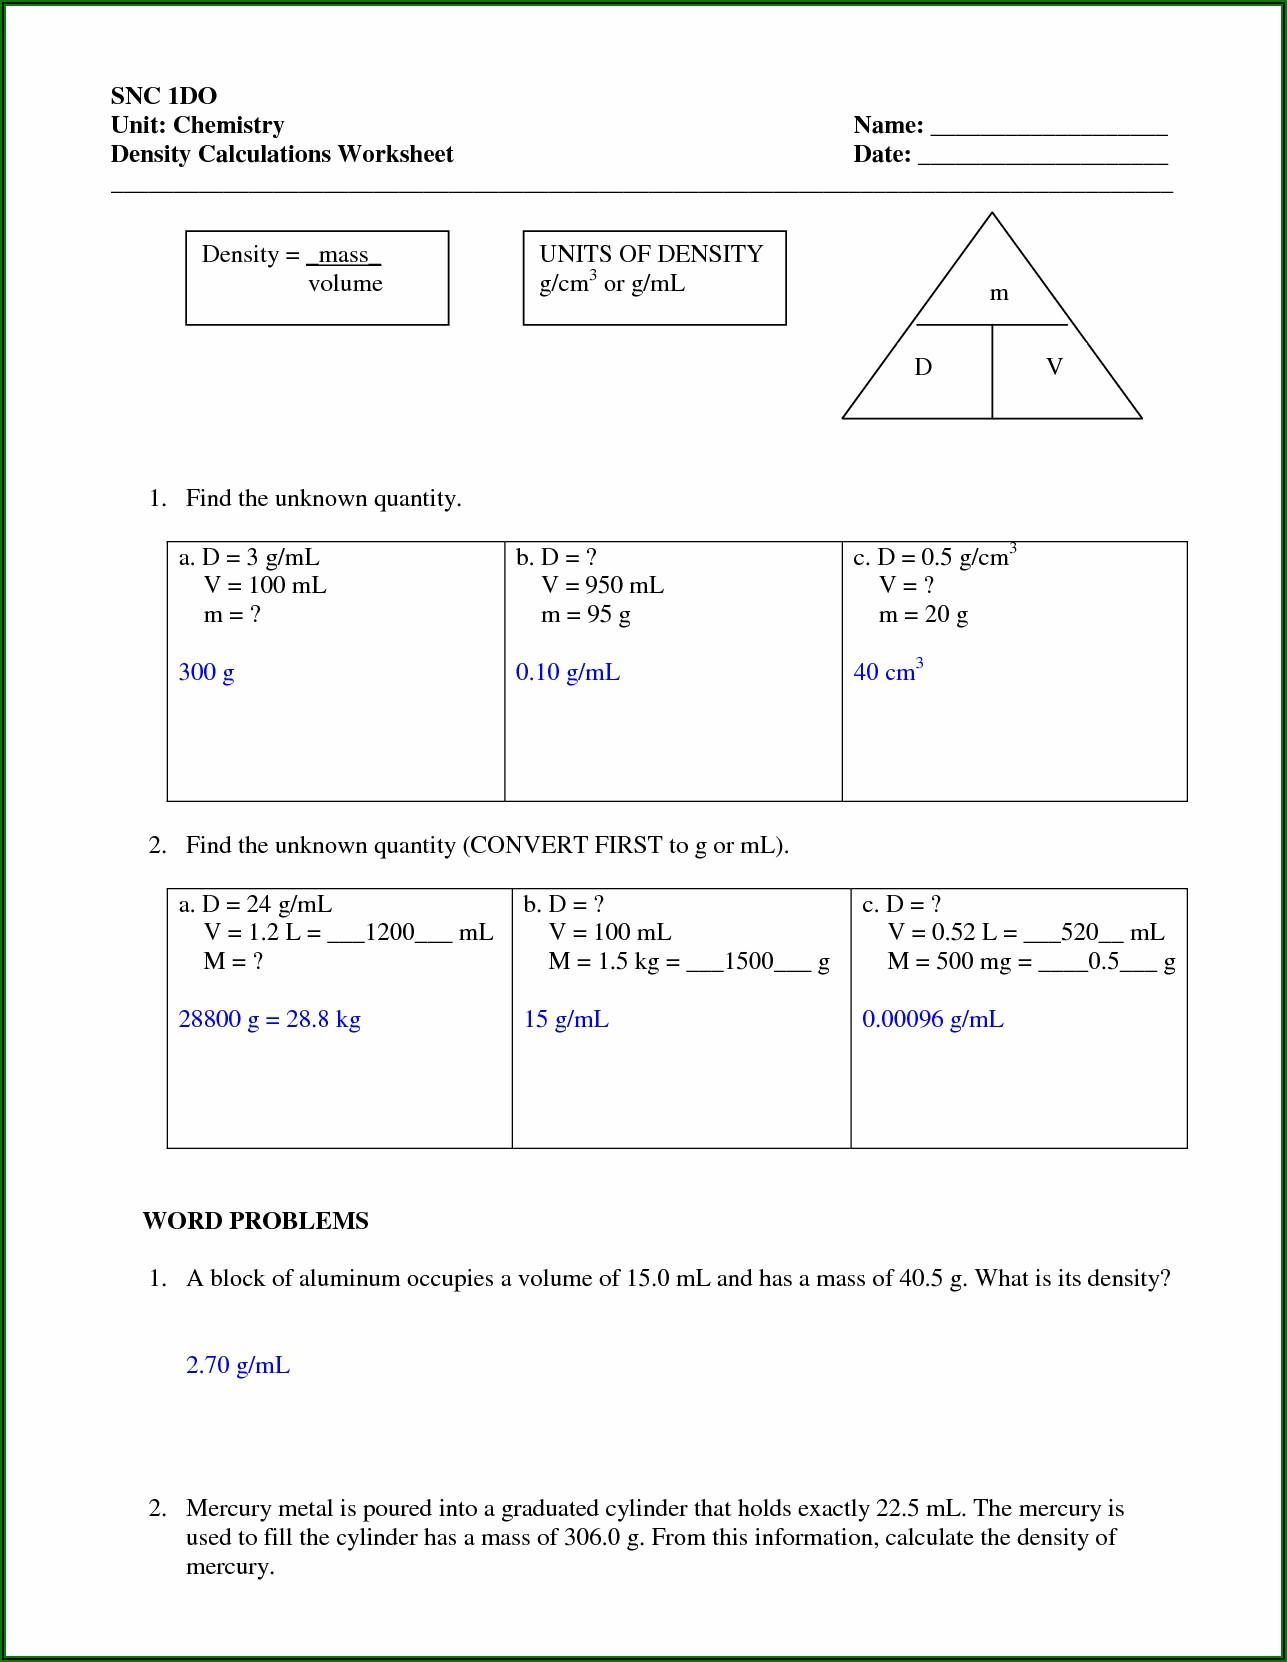 Density Calculations Worksheet 1 Answer Key